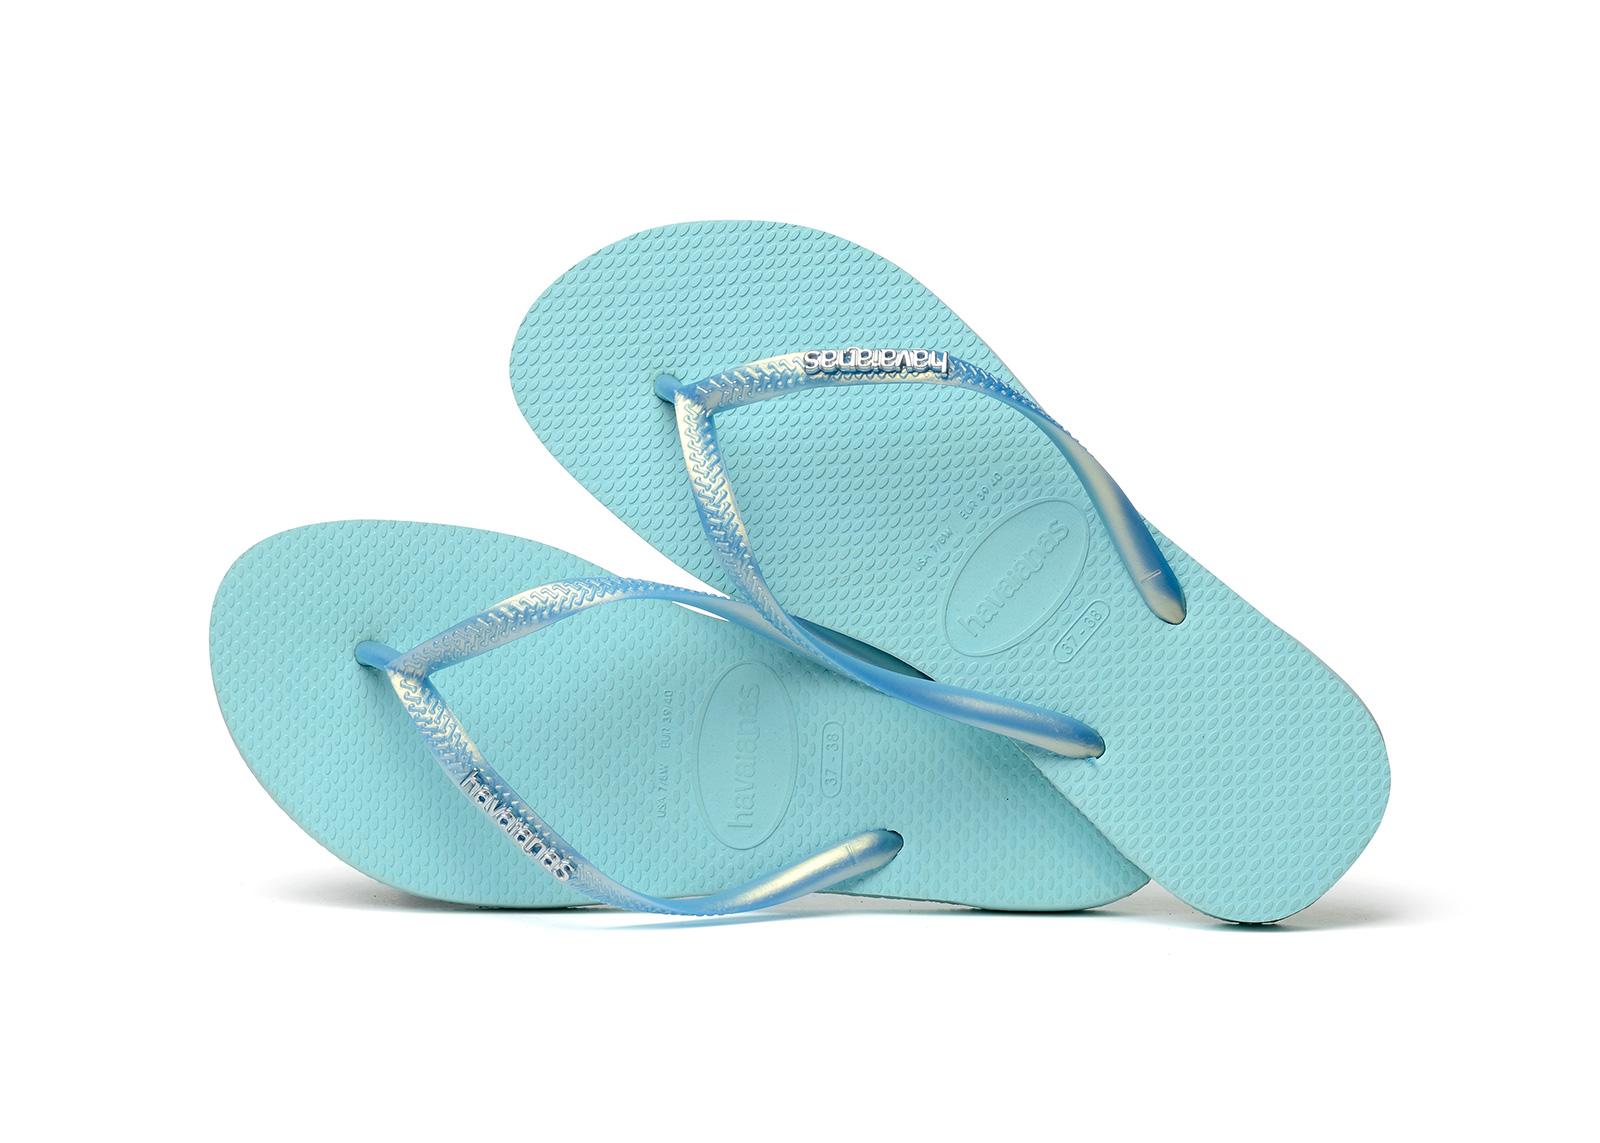 06781263e1b4f4 Flip-Flops Flip-flops - Havaianas Slim Logo Metallic Ice Blue